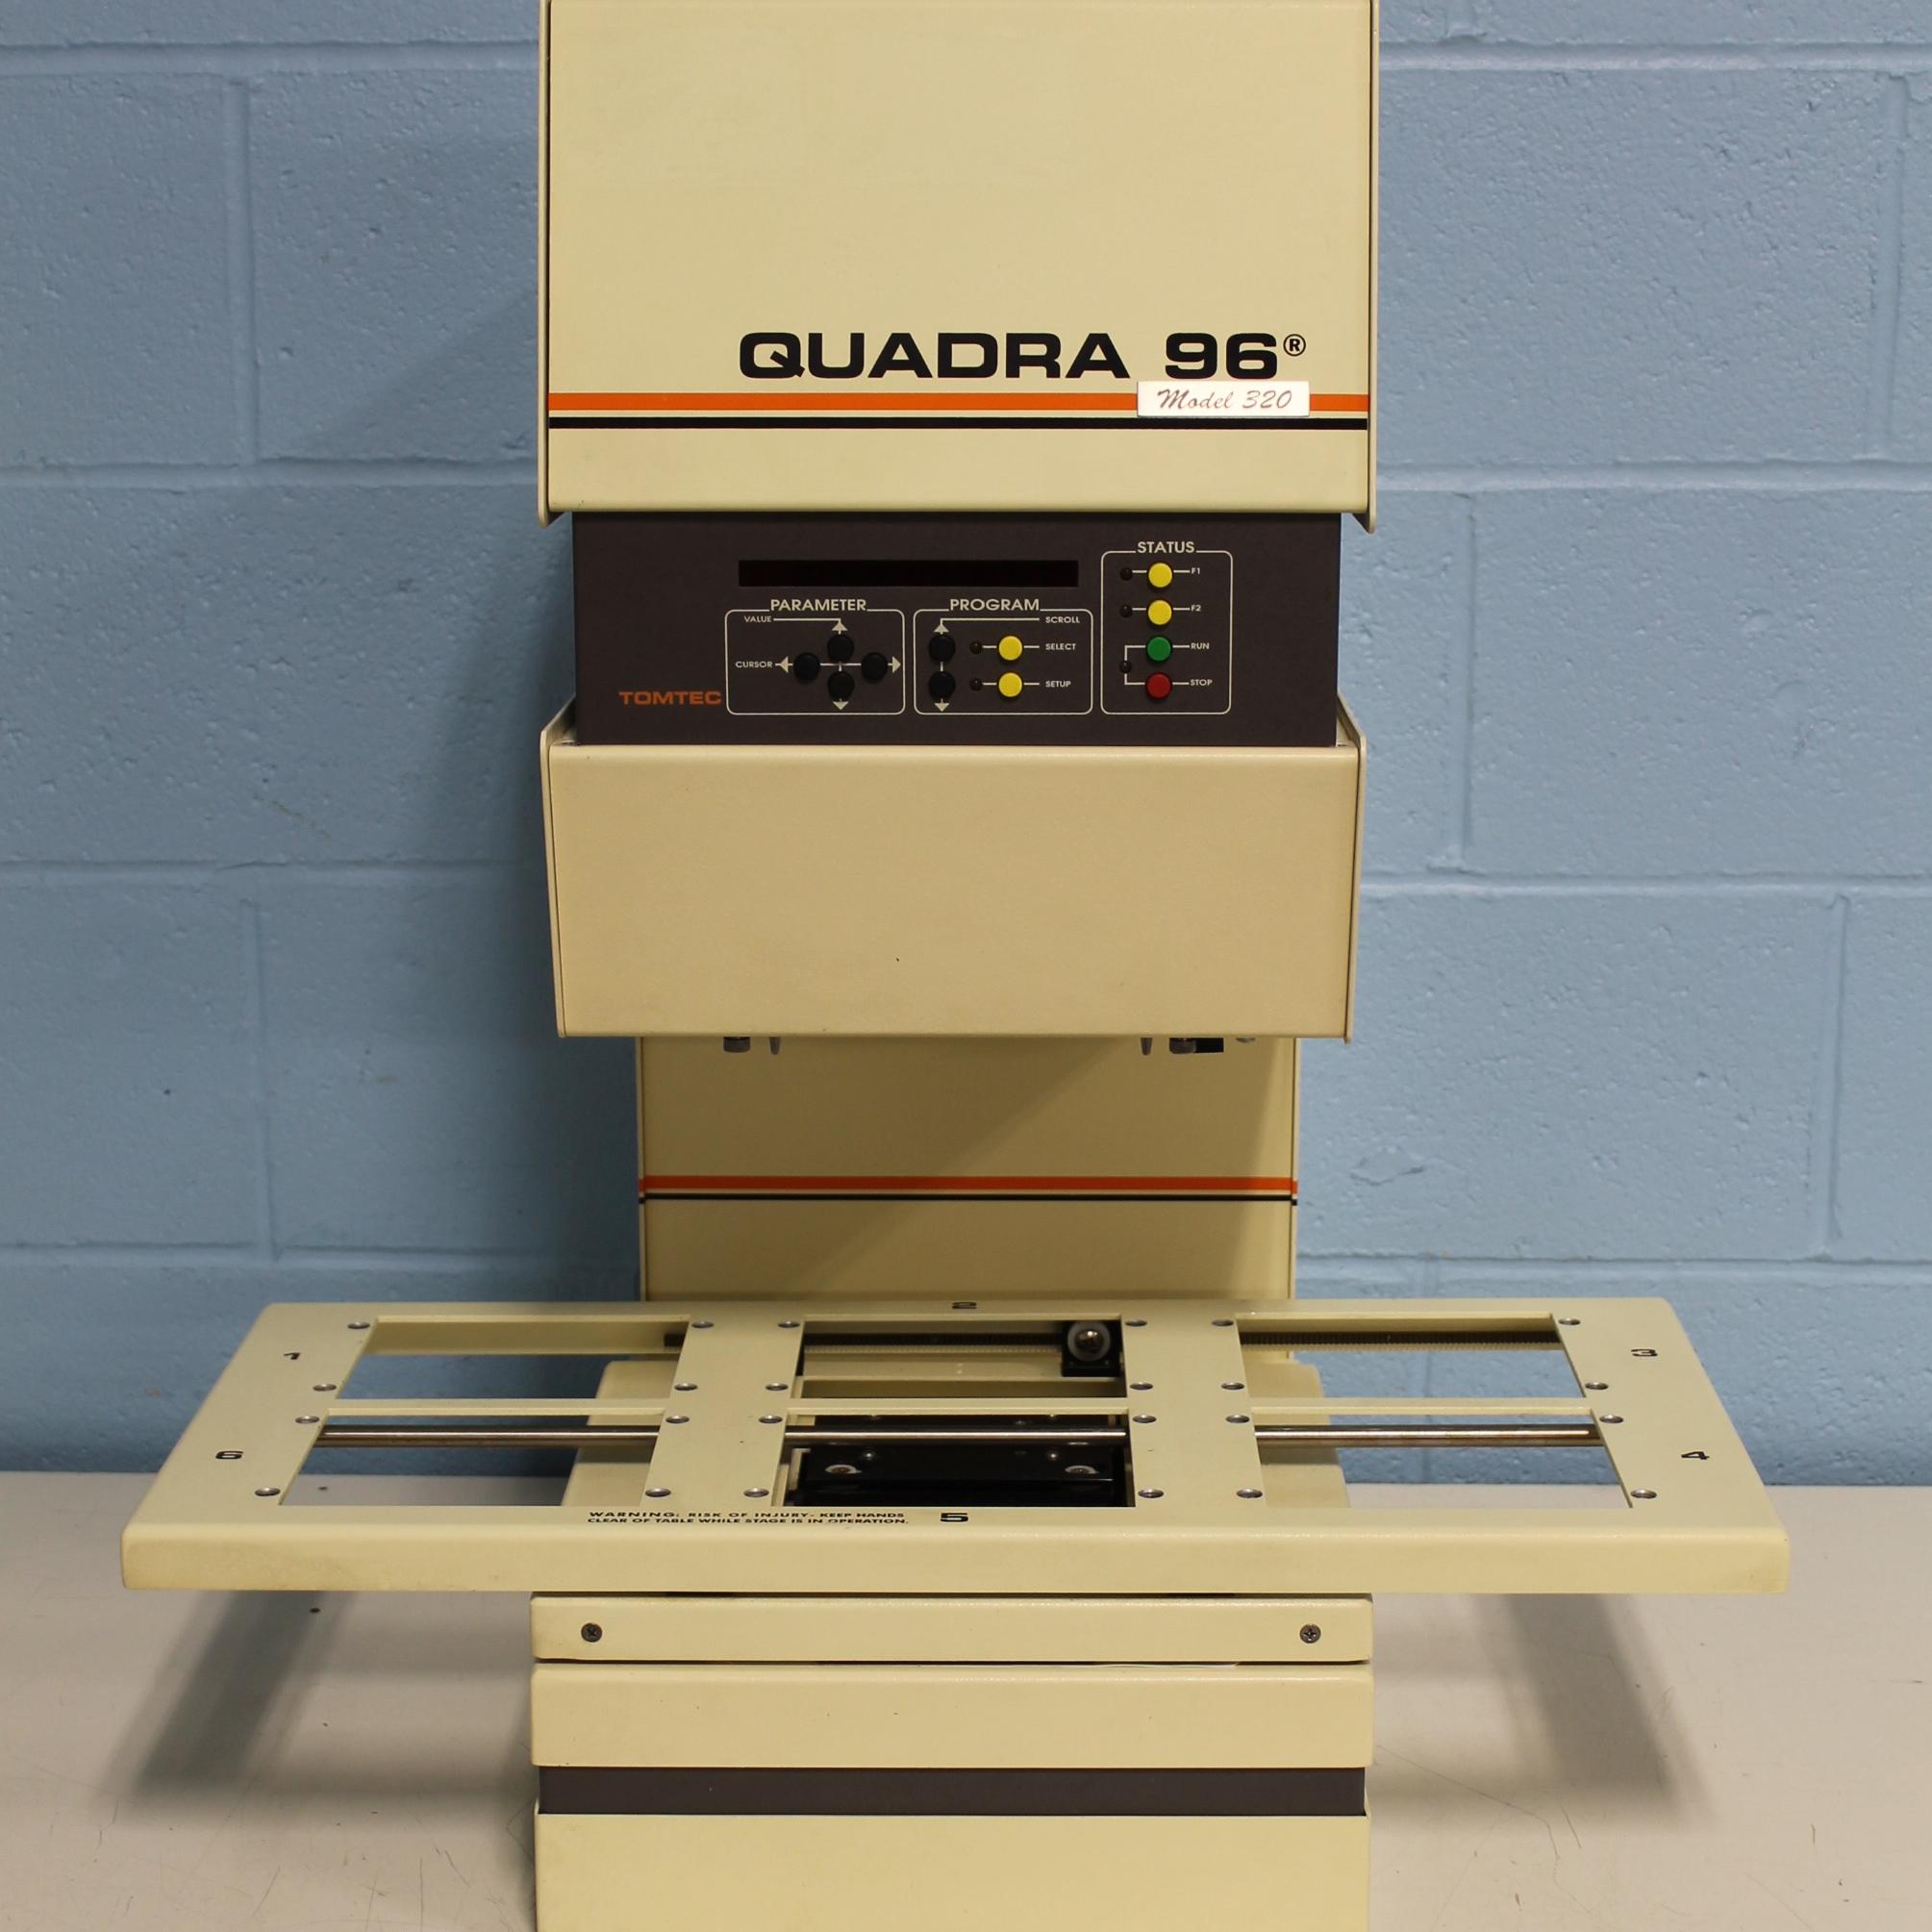 Quadra 96 Model 320 Liquid Handling System Name